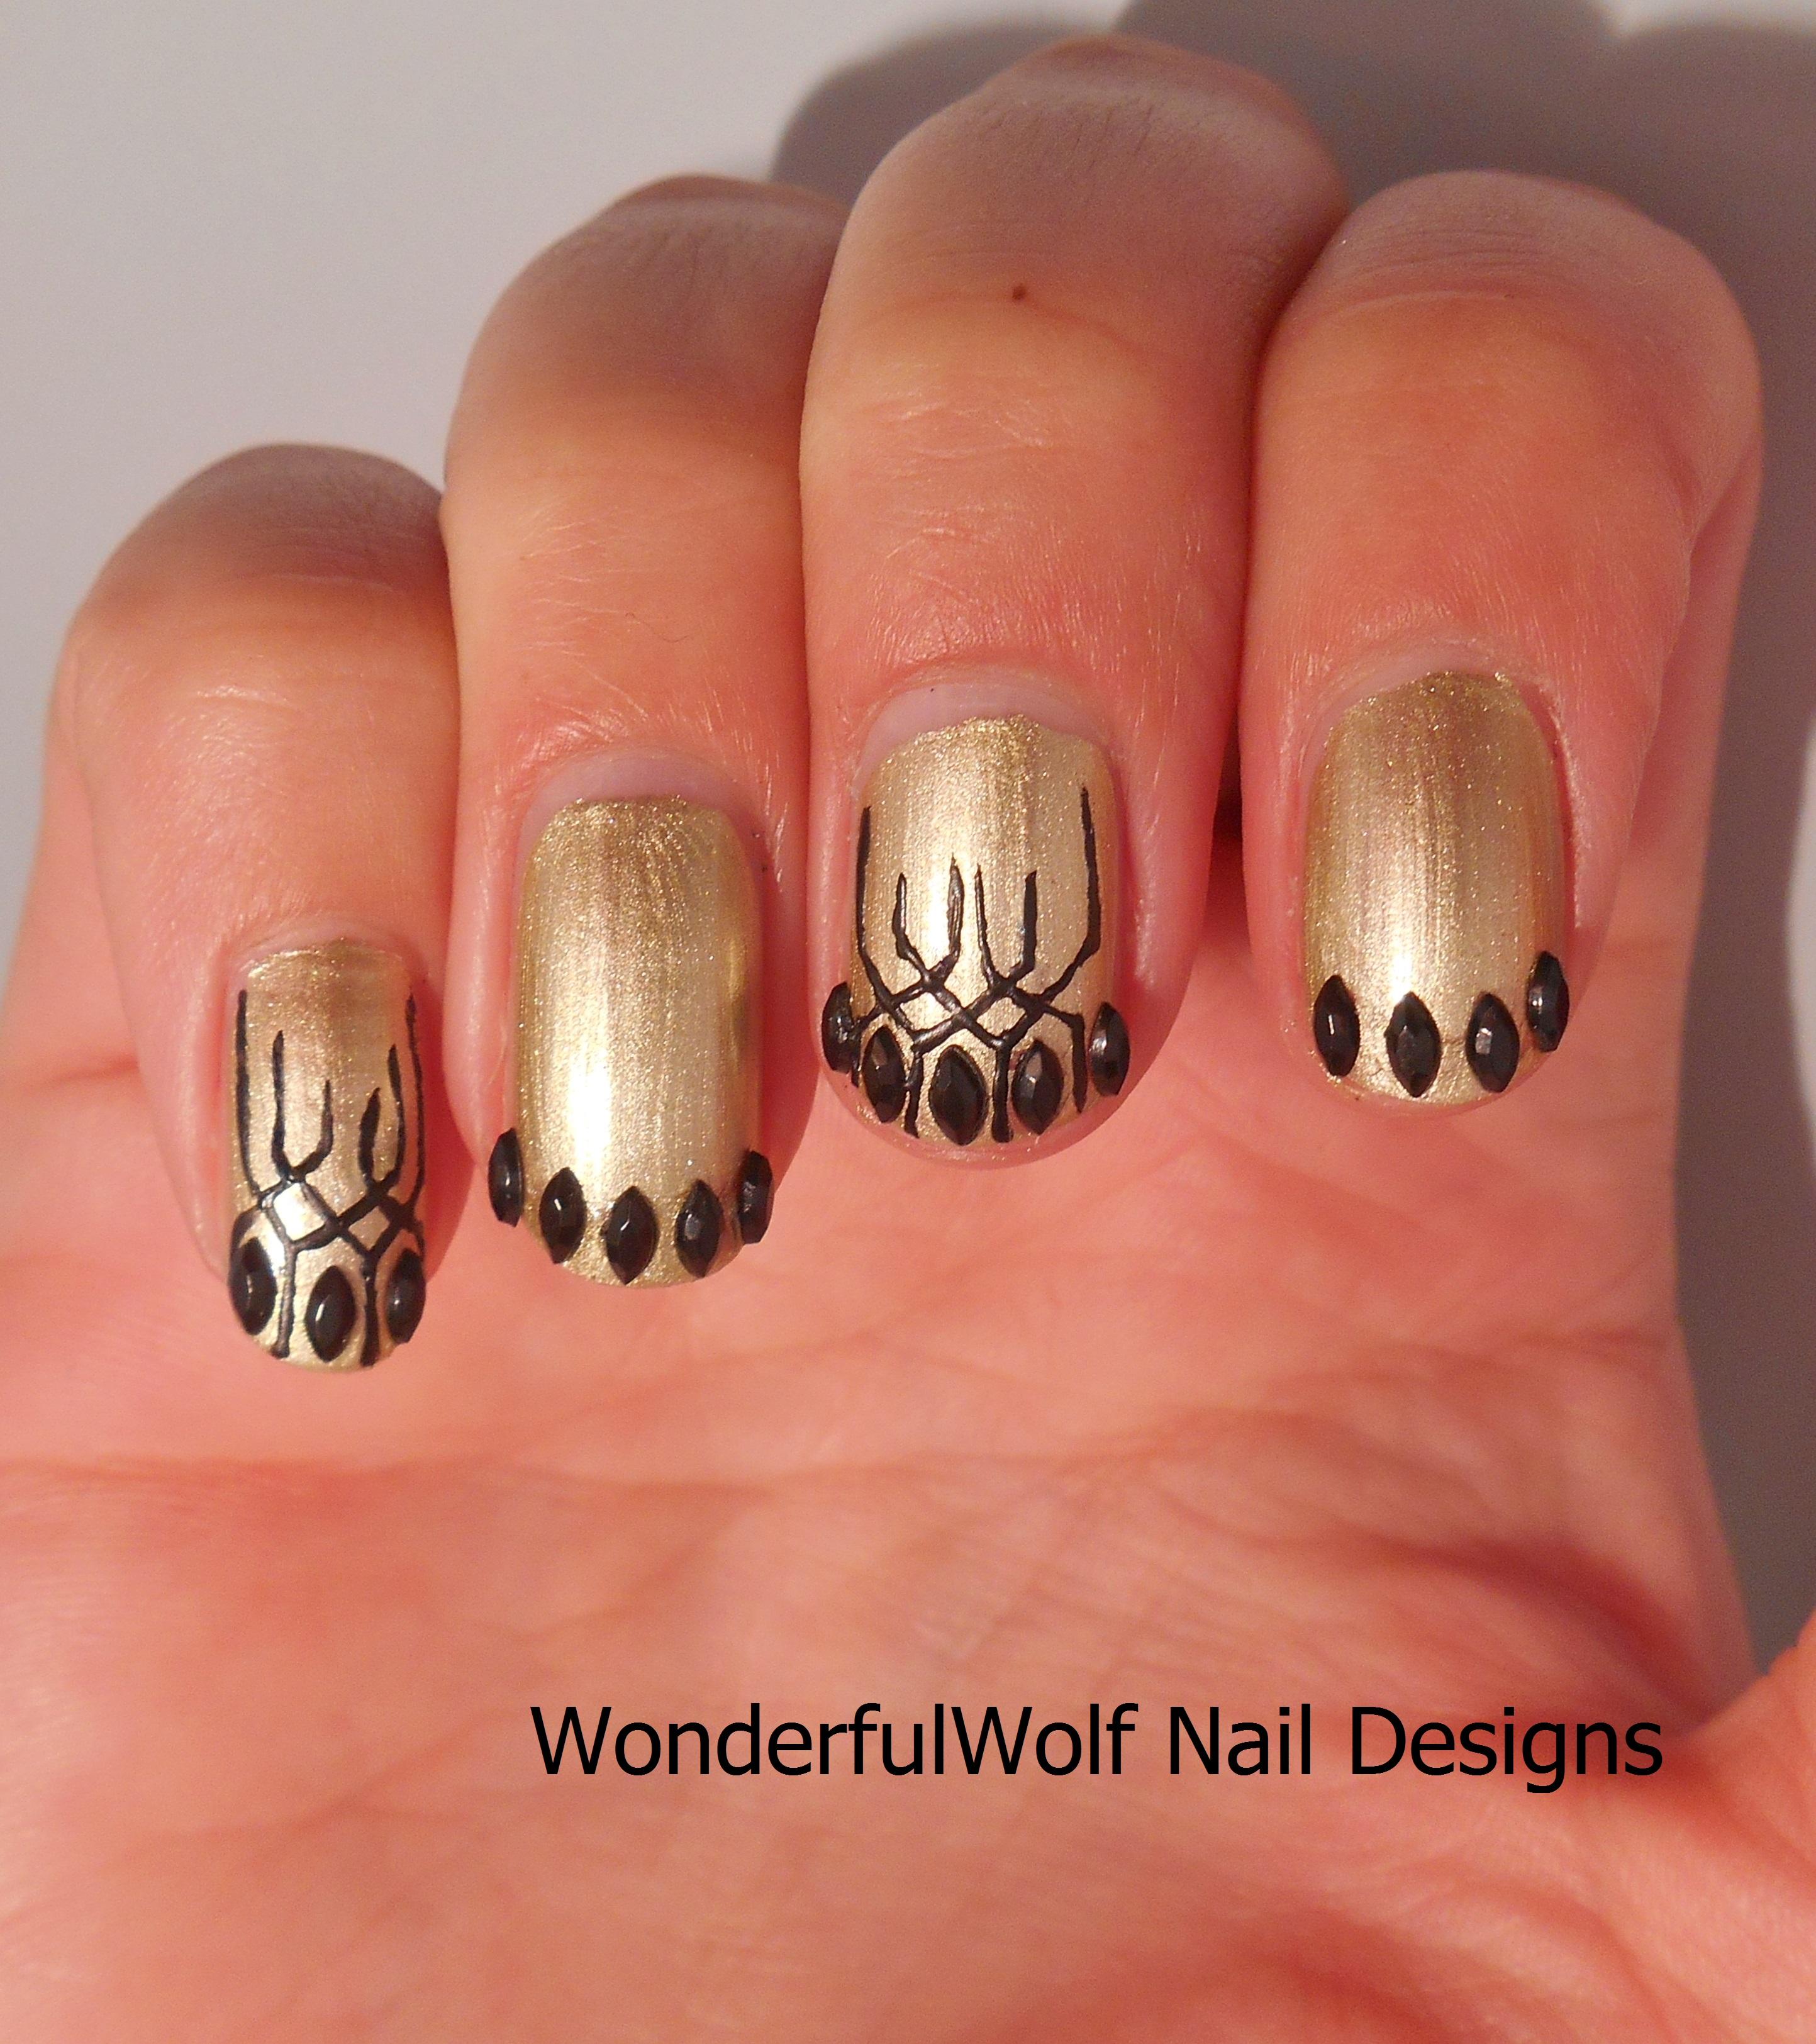 Funky French Manicure Nail Art Wonderfulwolf